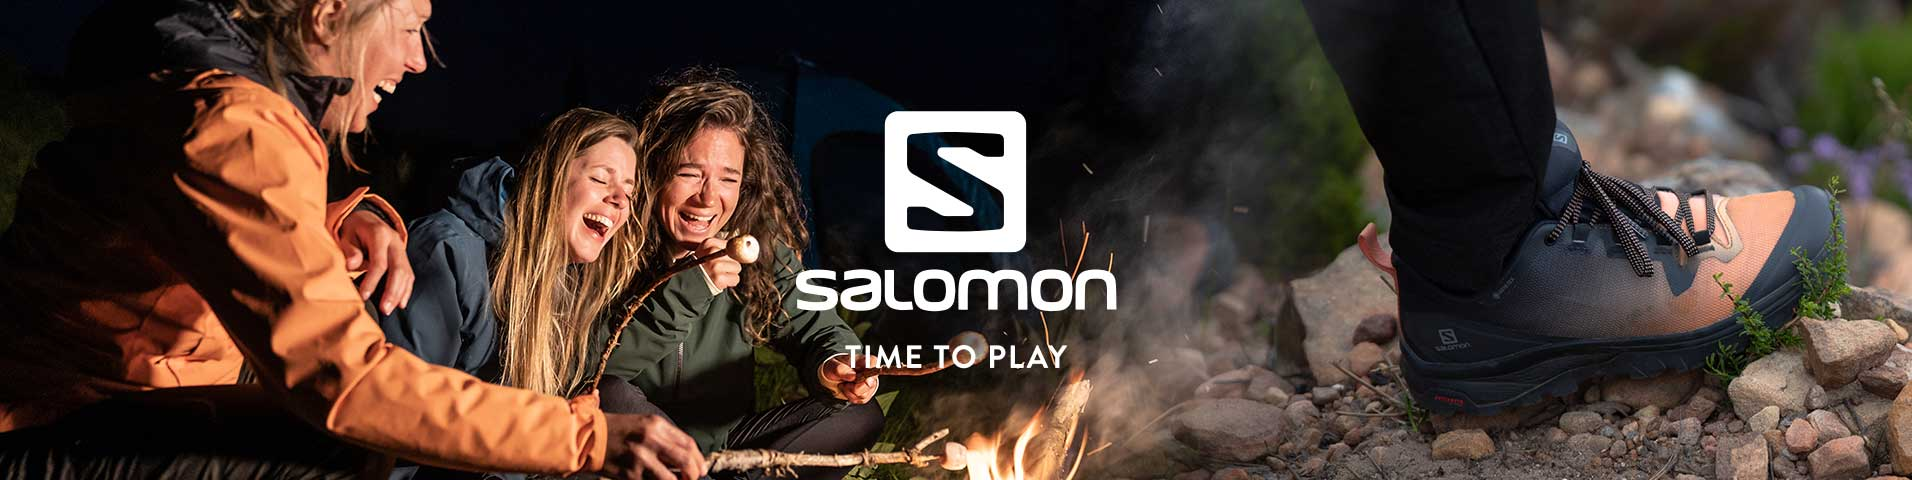 salomon rx slide zalando opiniones